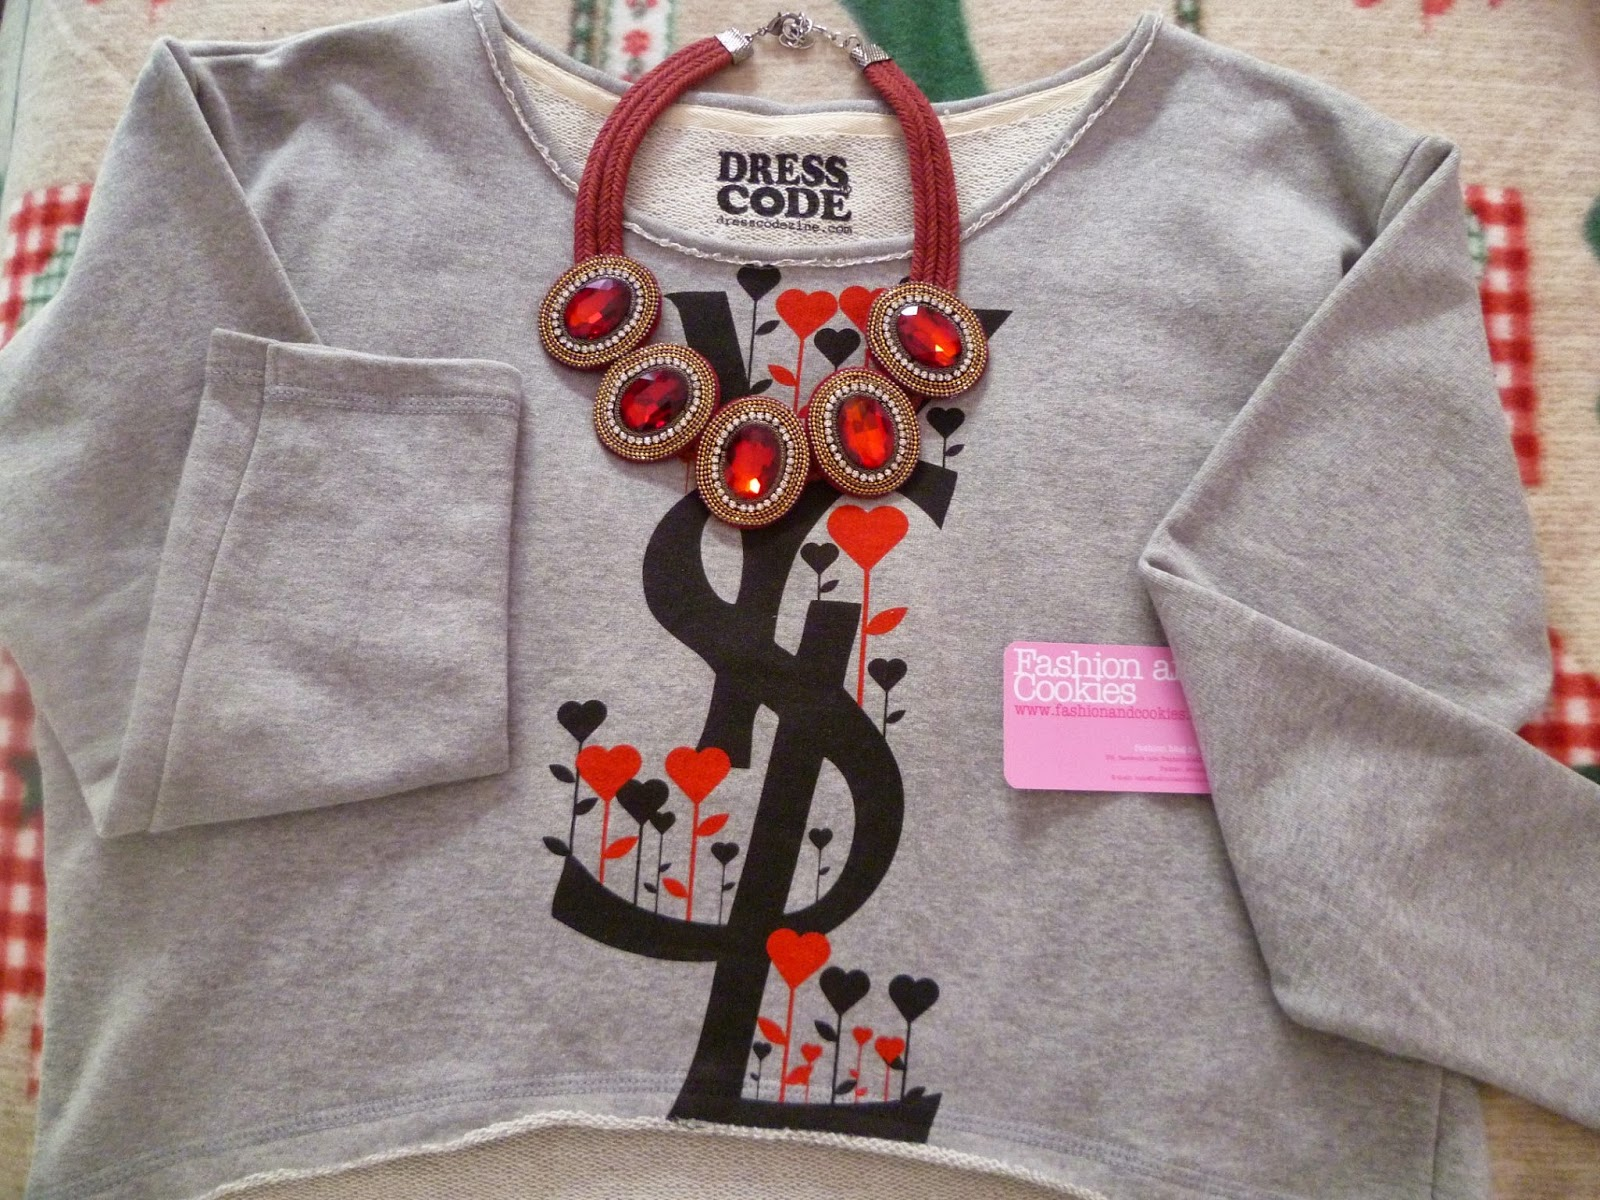 Dresscode sweatshirt, Dresscode felpe, Fashion and Cookies, fashion blogger